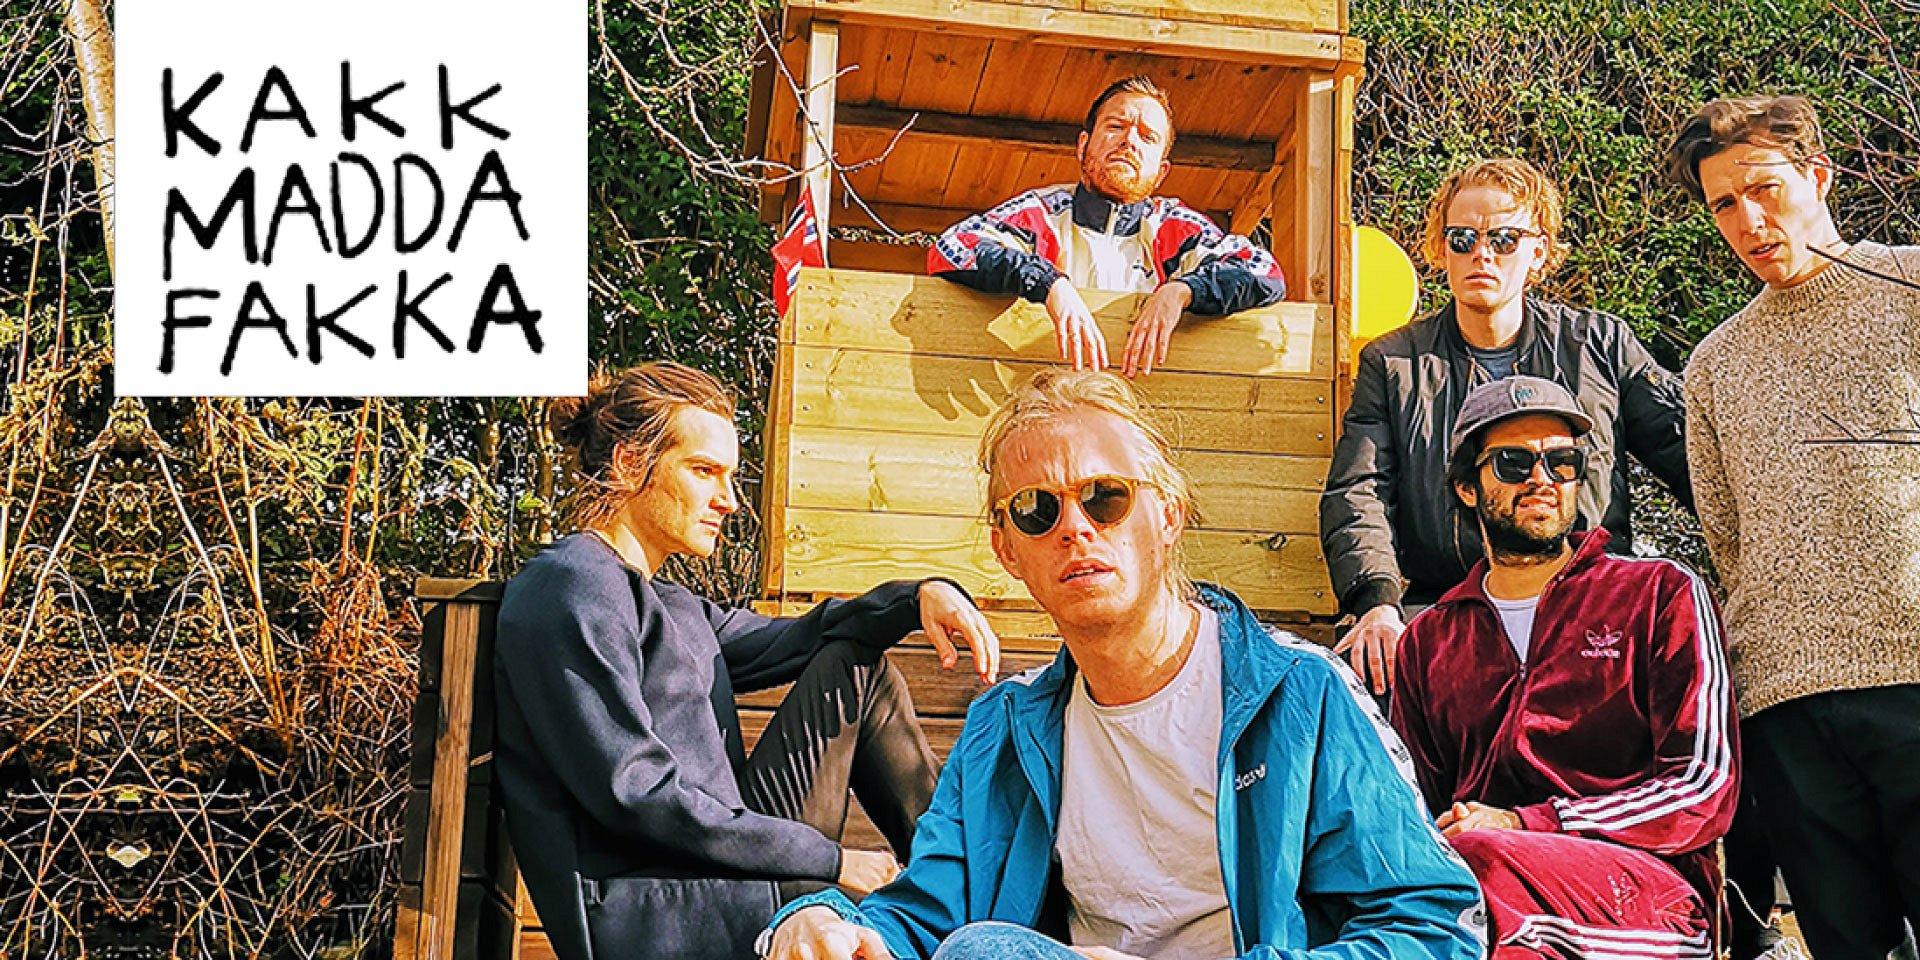 Kakkmaddafakka regresa a El Plaza con nuevo disco